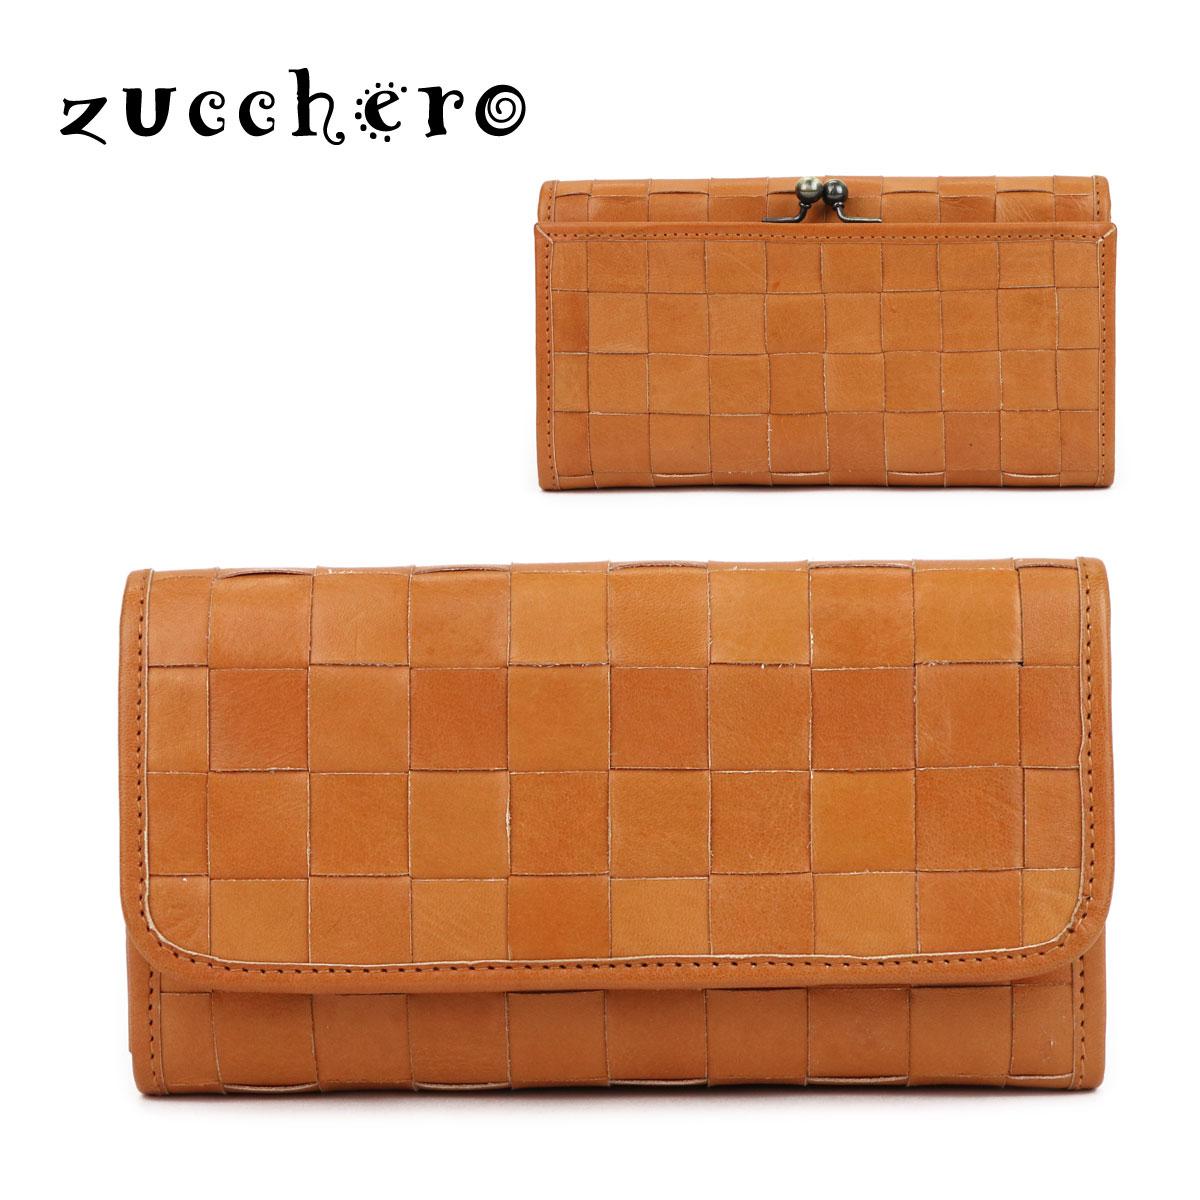 313c6f73b339 ・fesのフルタンニンレザー編み込みメッシュレザーのフラップ+がま口の2way長財布を新規出品しました。